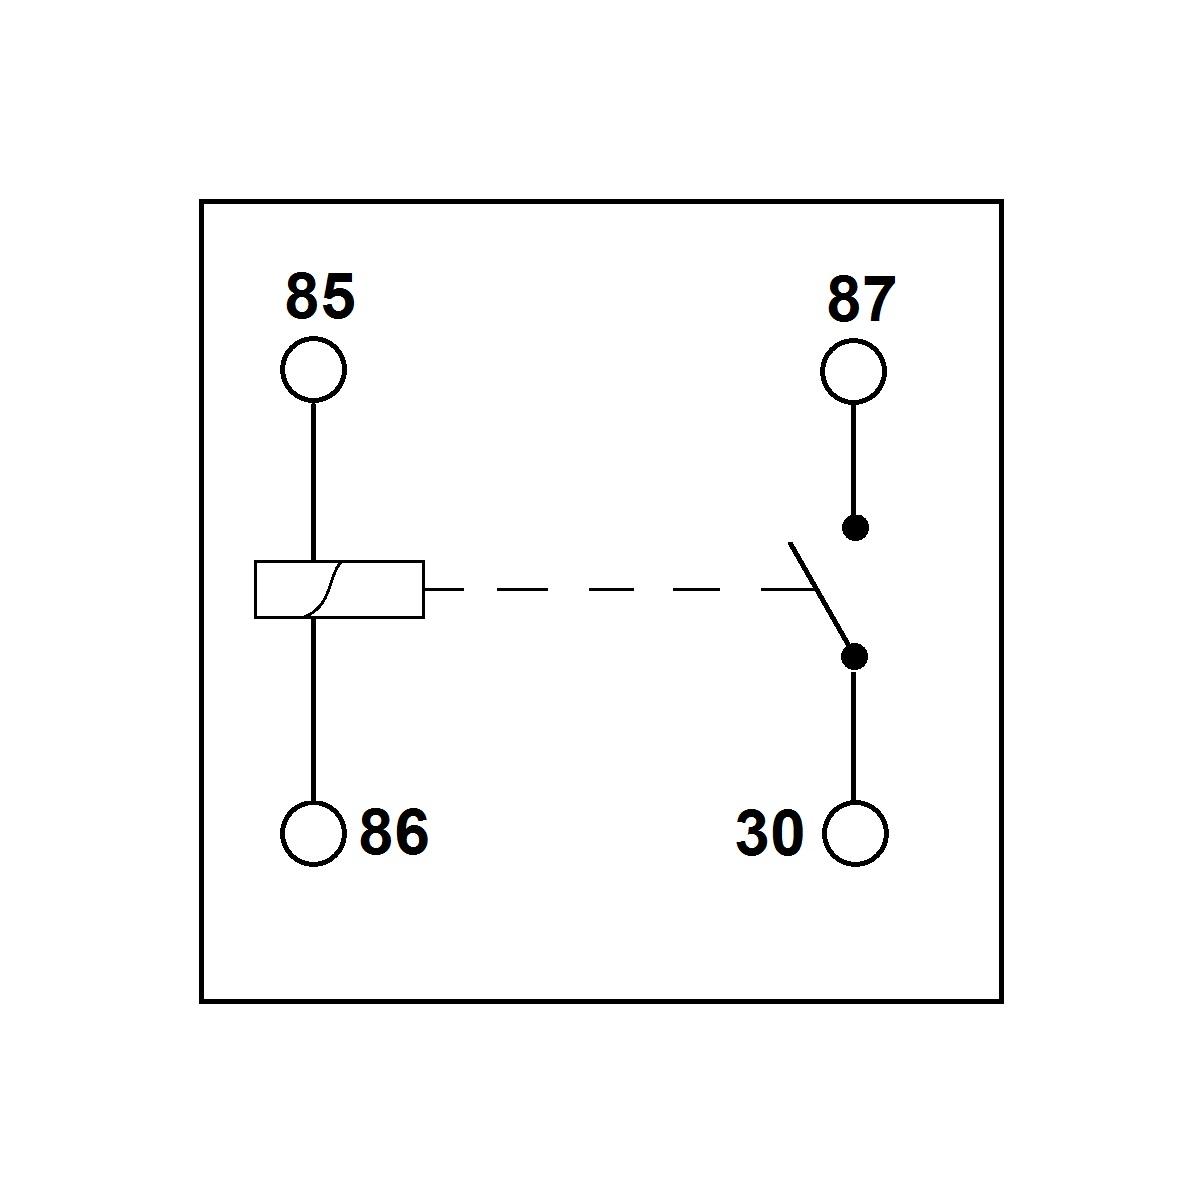 Standard 12 Volt Relay with Detachable Bracket